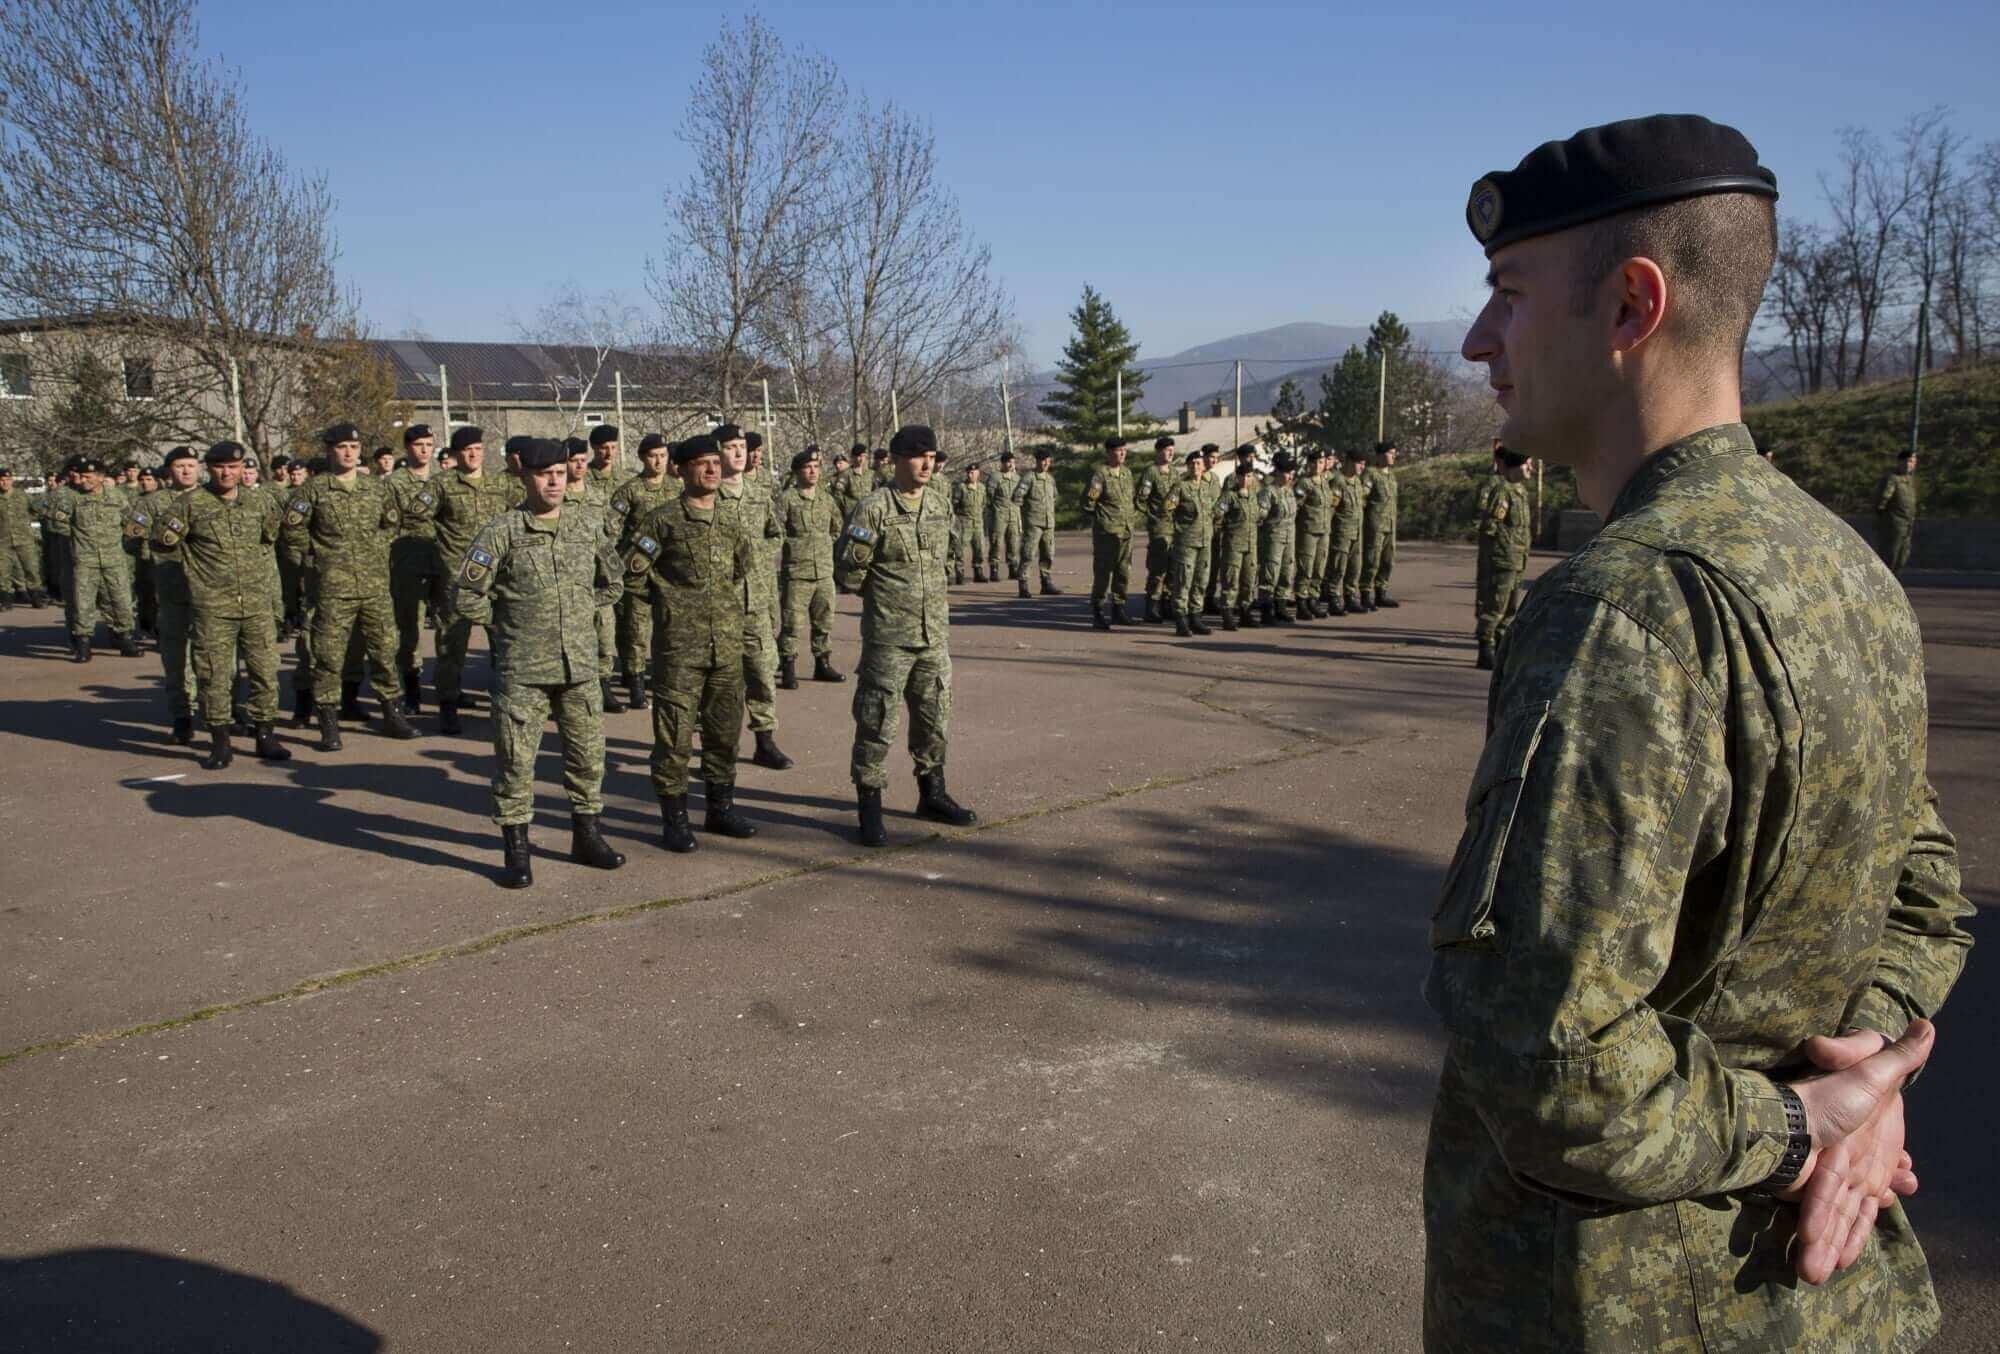 Kosovske snage bezbednosti: (ne)opravdan strah od transformacije